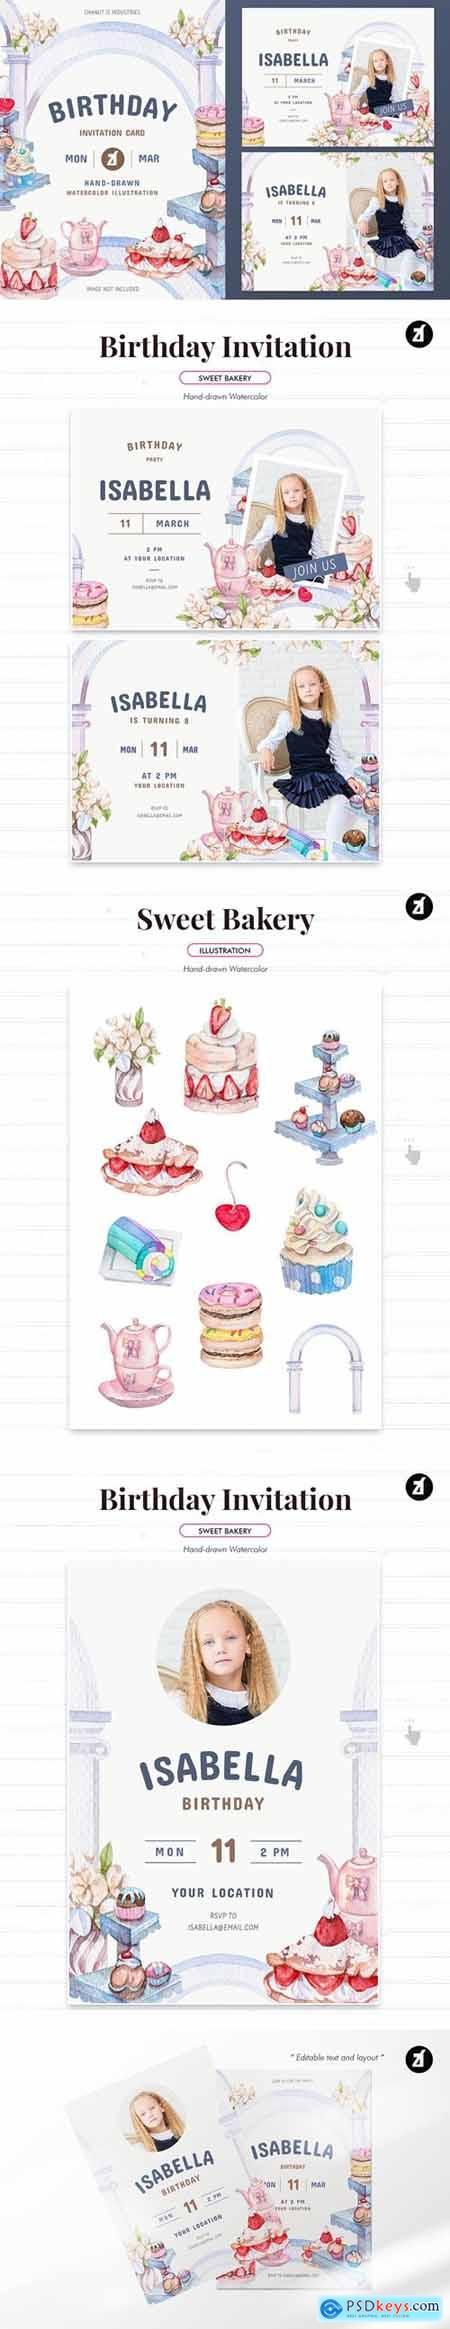 Sweet bakery theme birthday invitation card